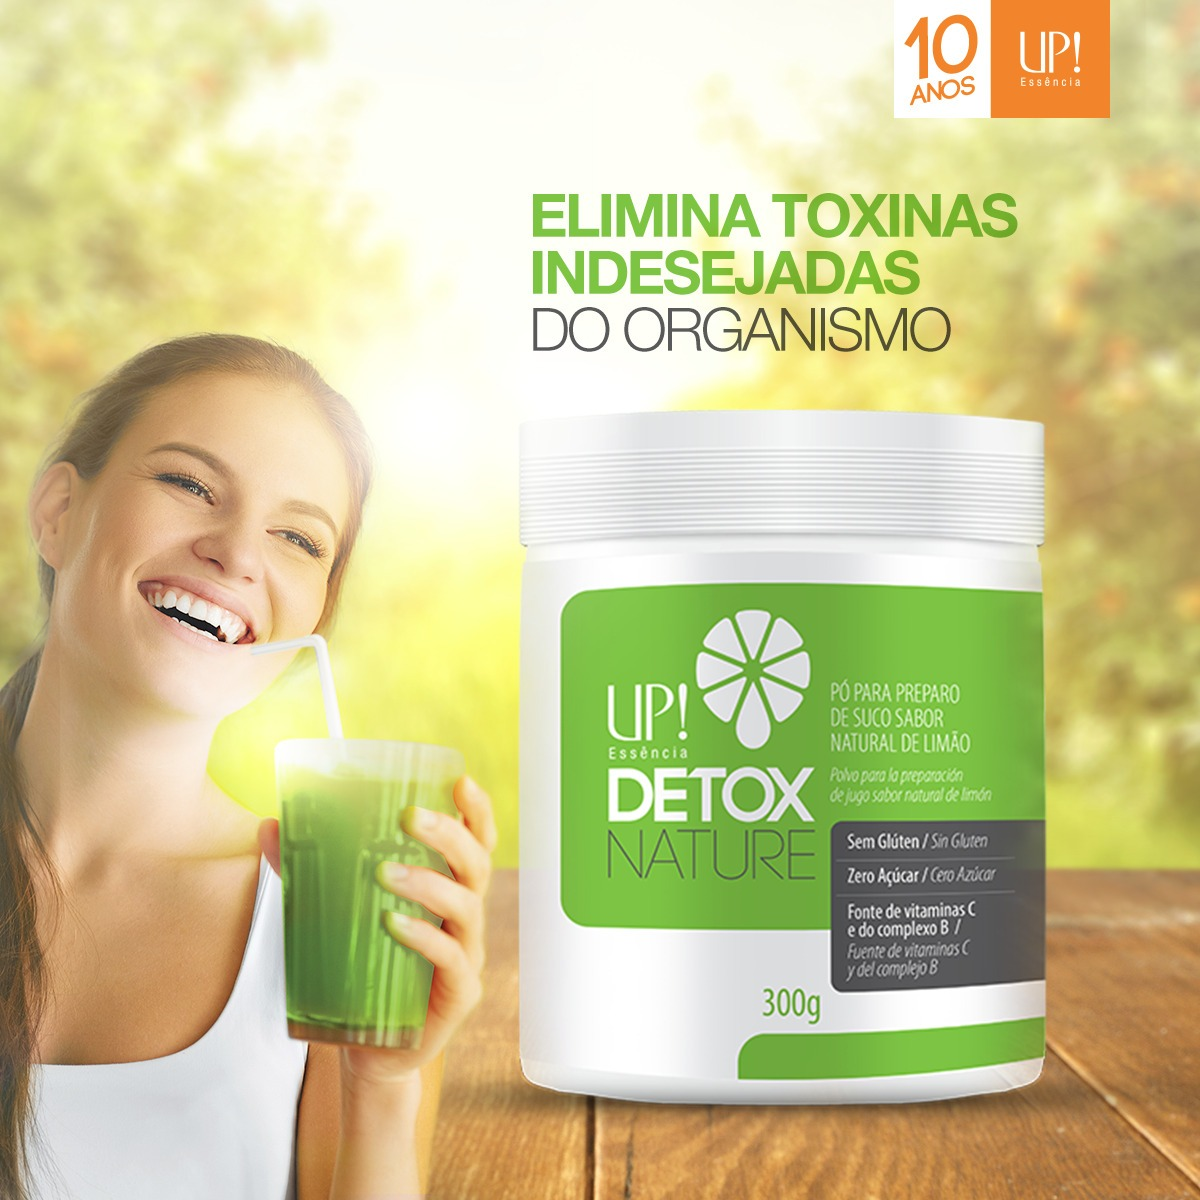 detox shake emagrece